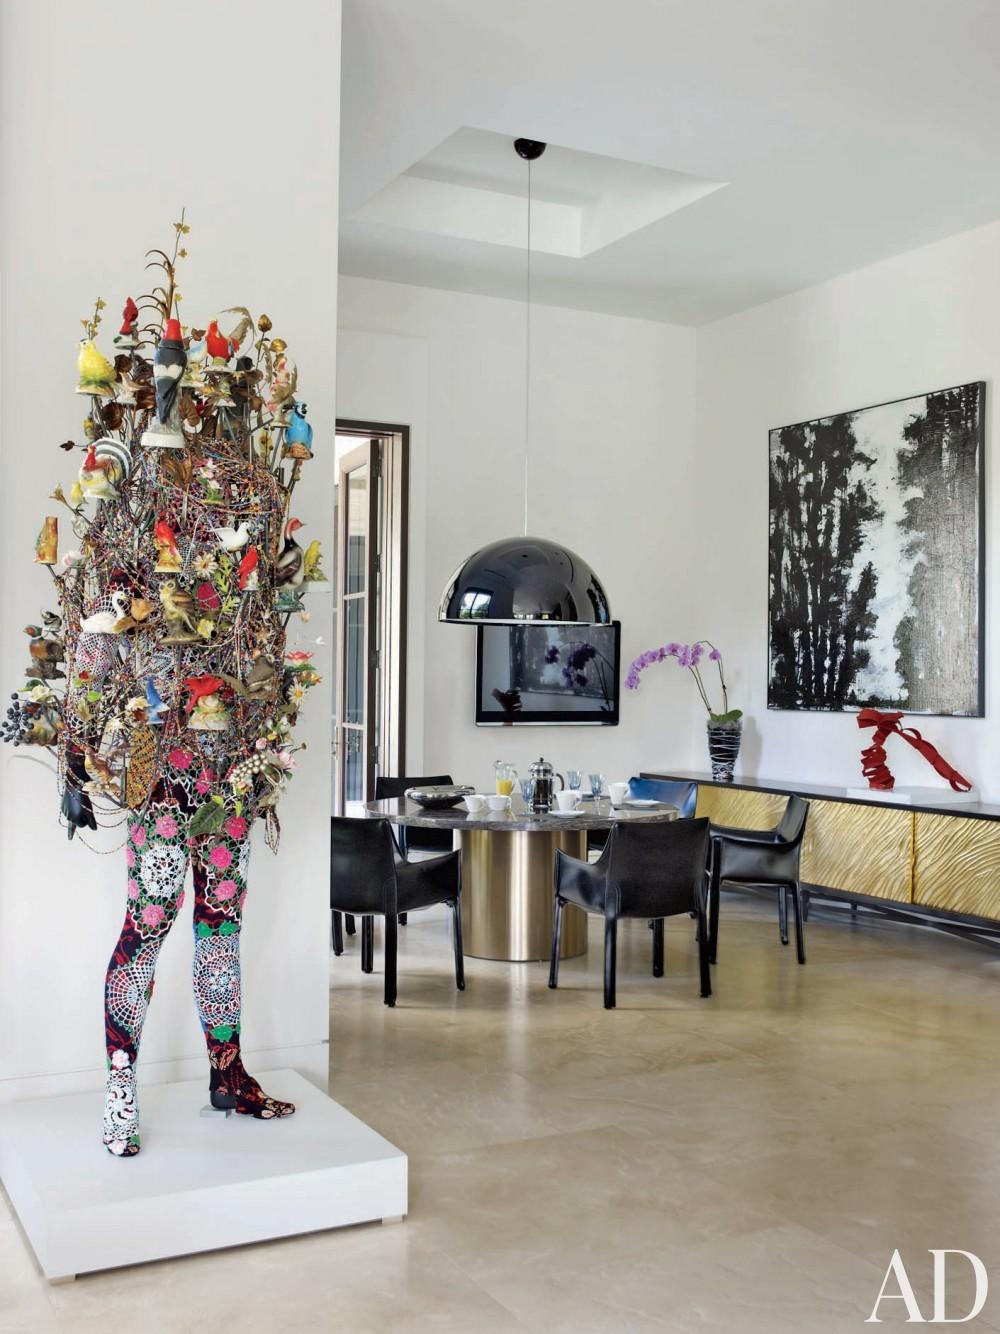 Contemporary Breakfast area by Furze Bard + Associates and Manuel J. Diaz in Jupiter, Florida